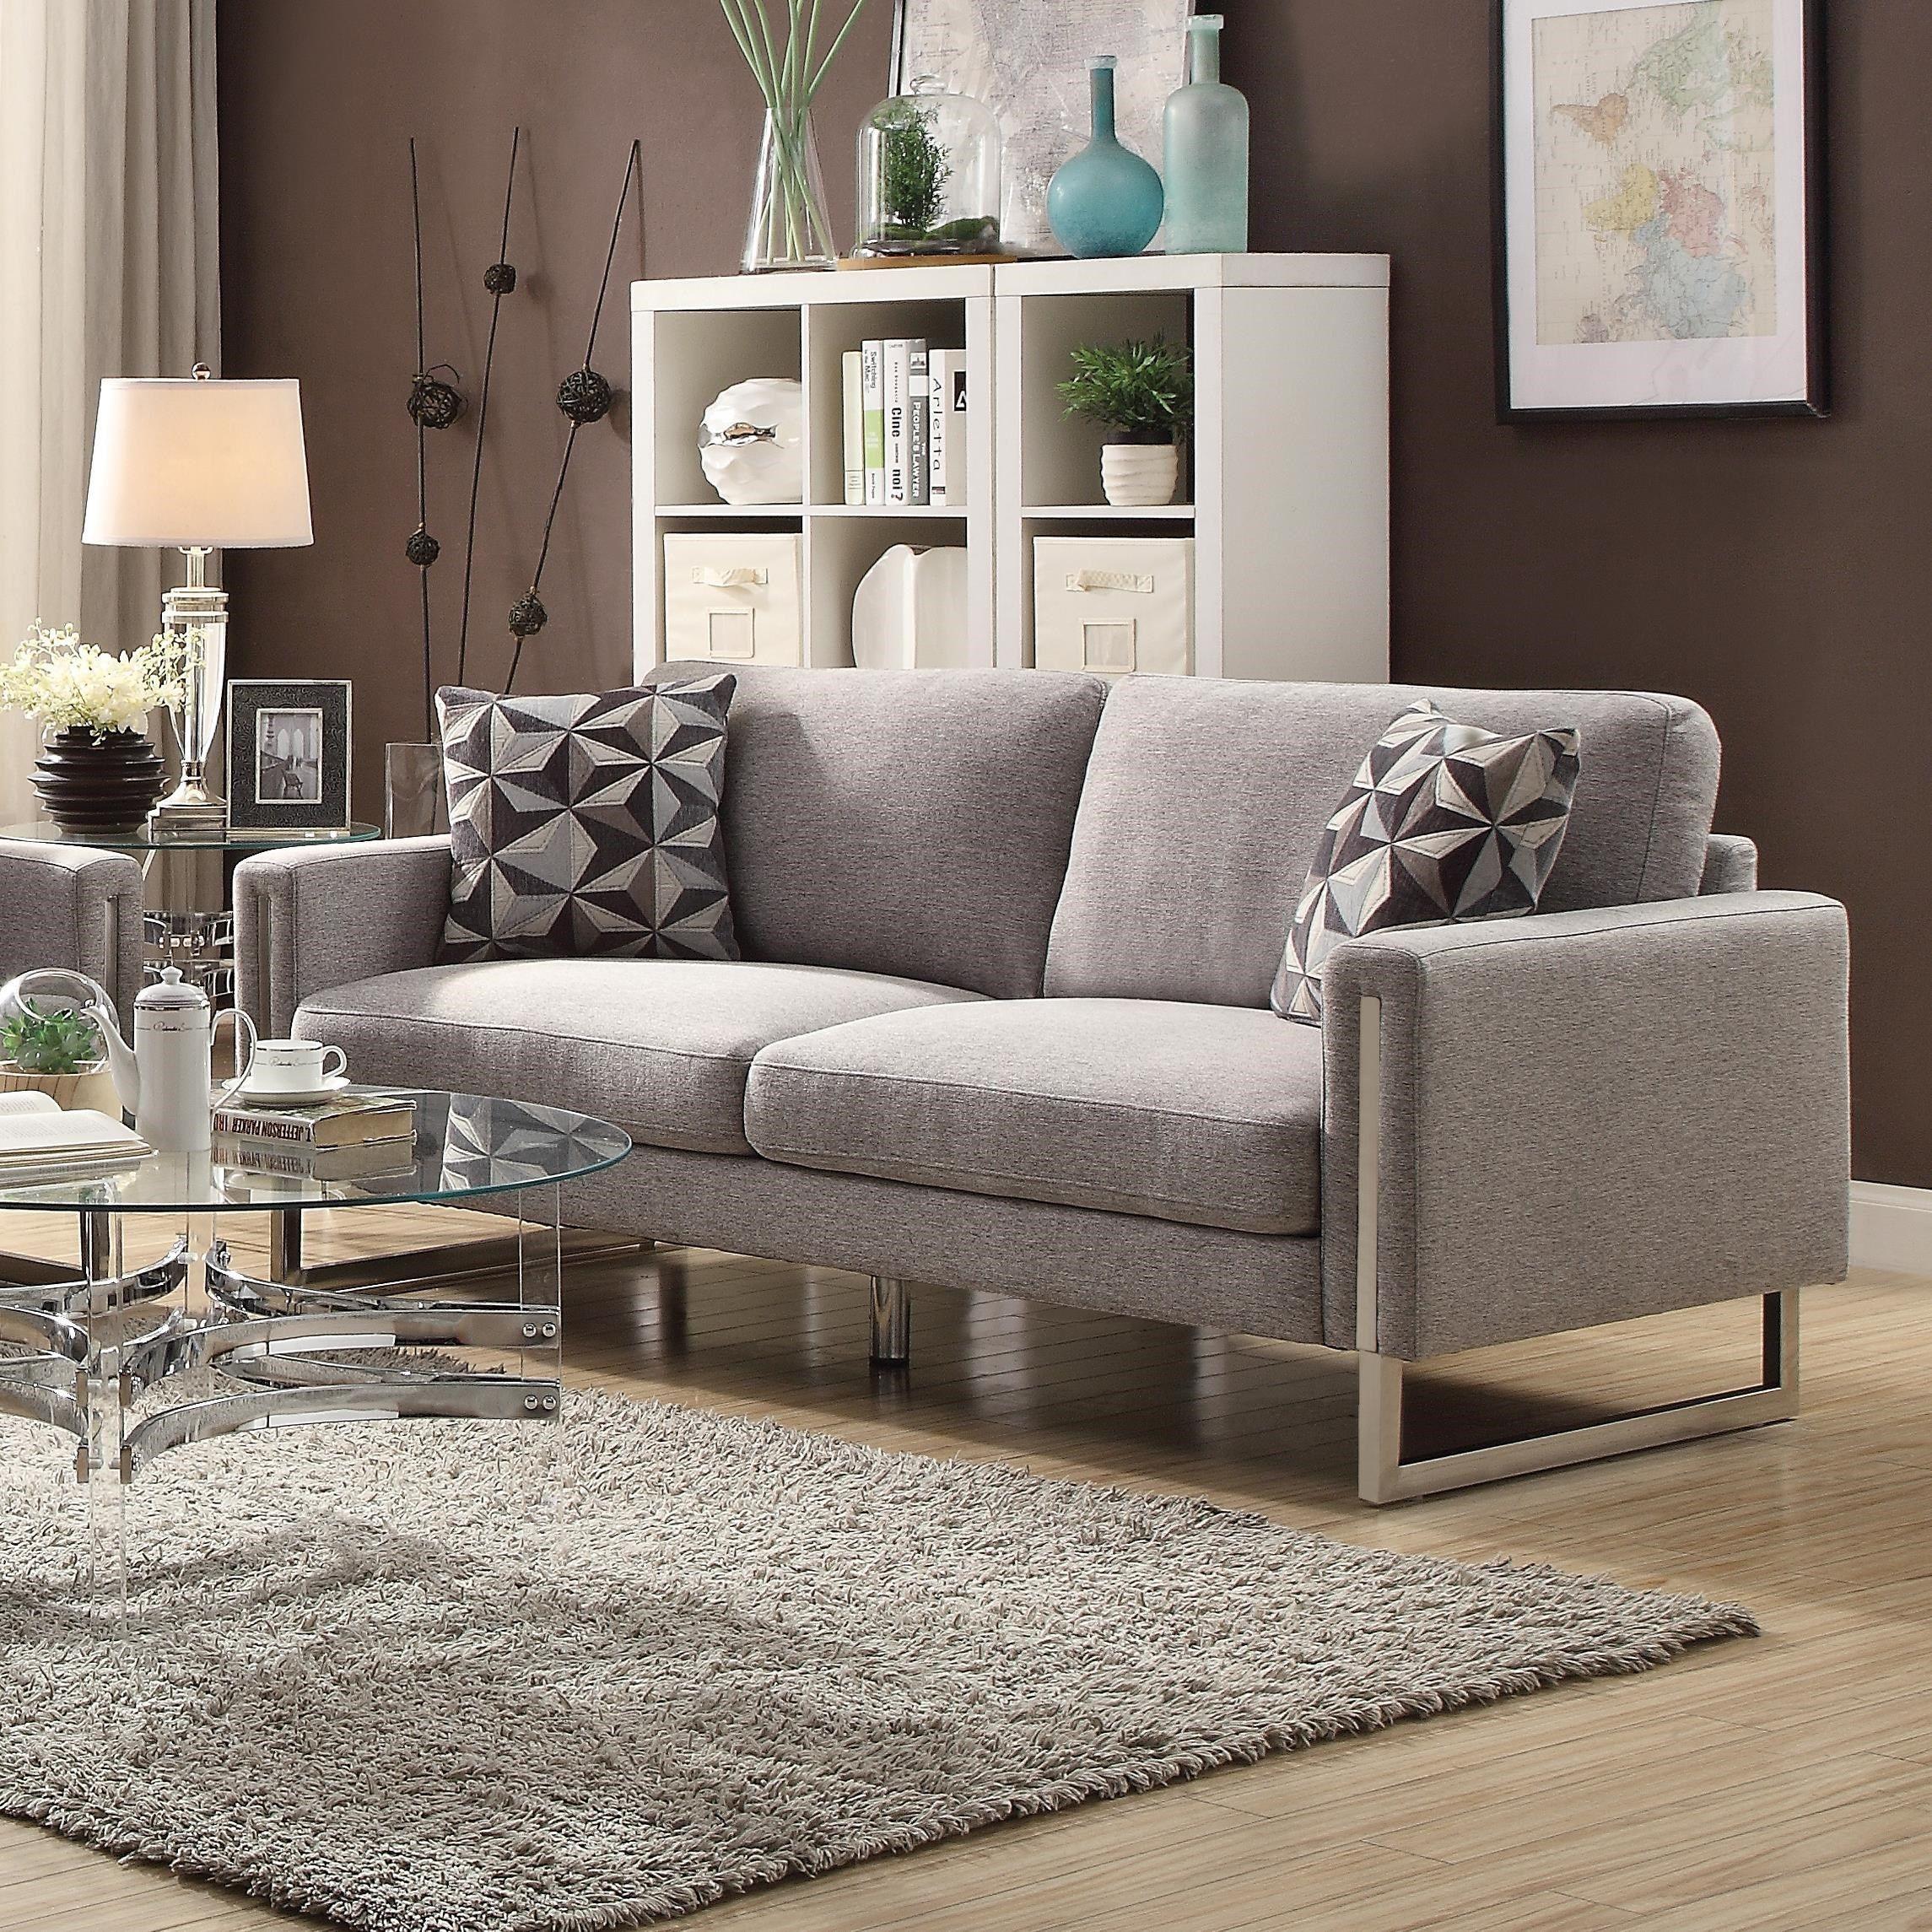 Wondrous Coaster Stellan Modern Sofa With U Shaped Steel Legs Unemploymentrelief Wooden Chair Designs For Living Room Unemploymentrelieforg